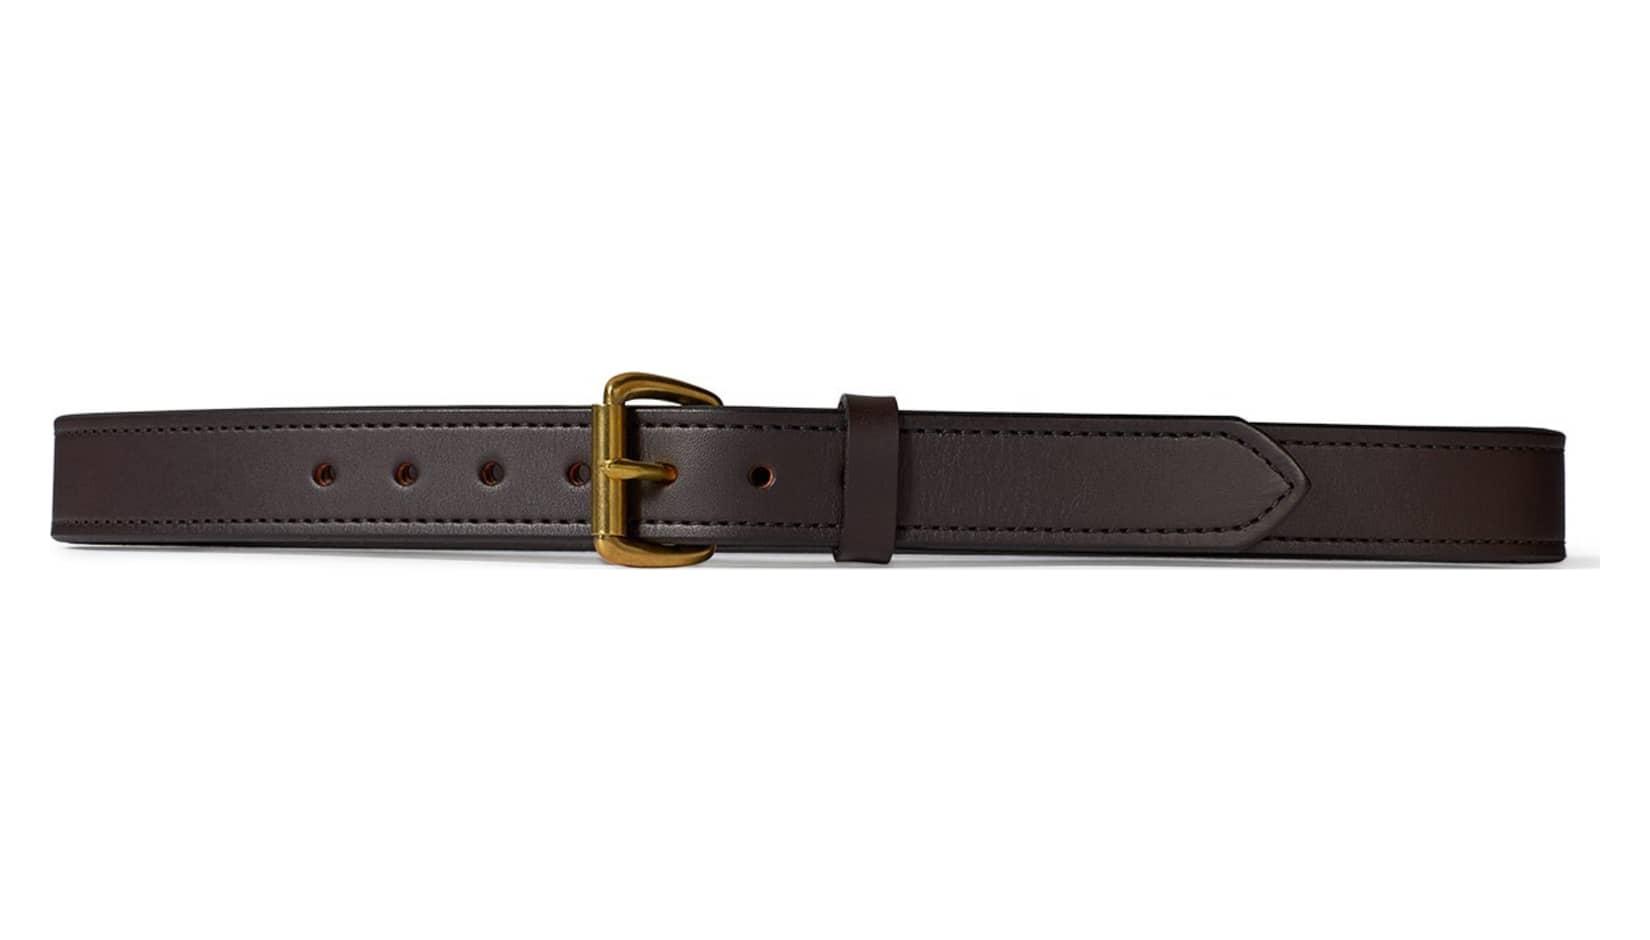 filson 63205 1 1 4 inch leather belt brown w brass